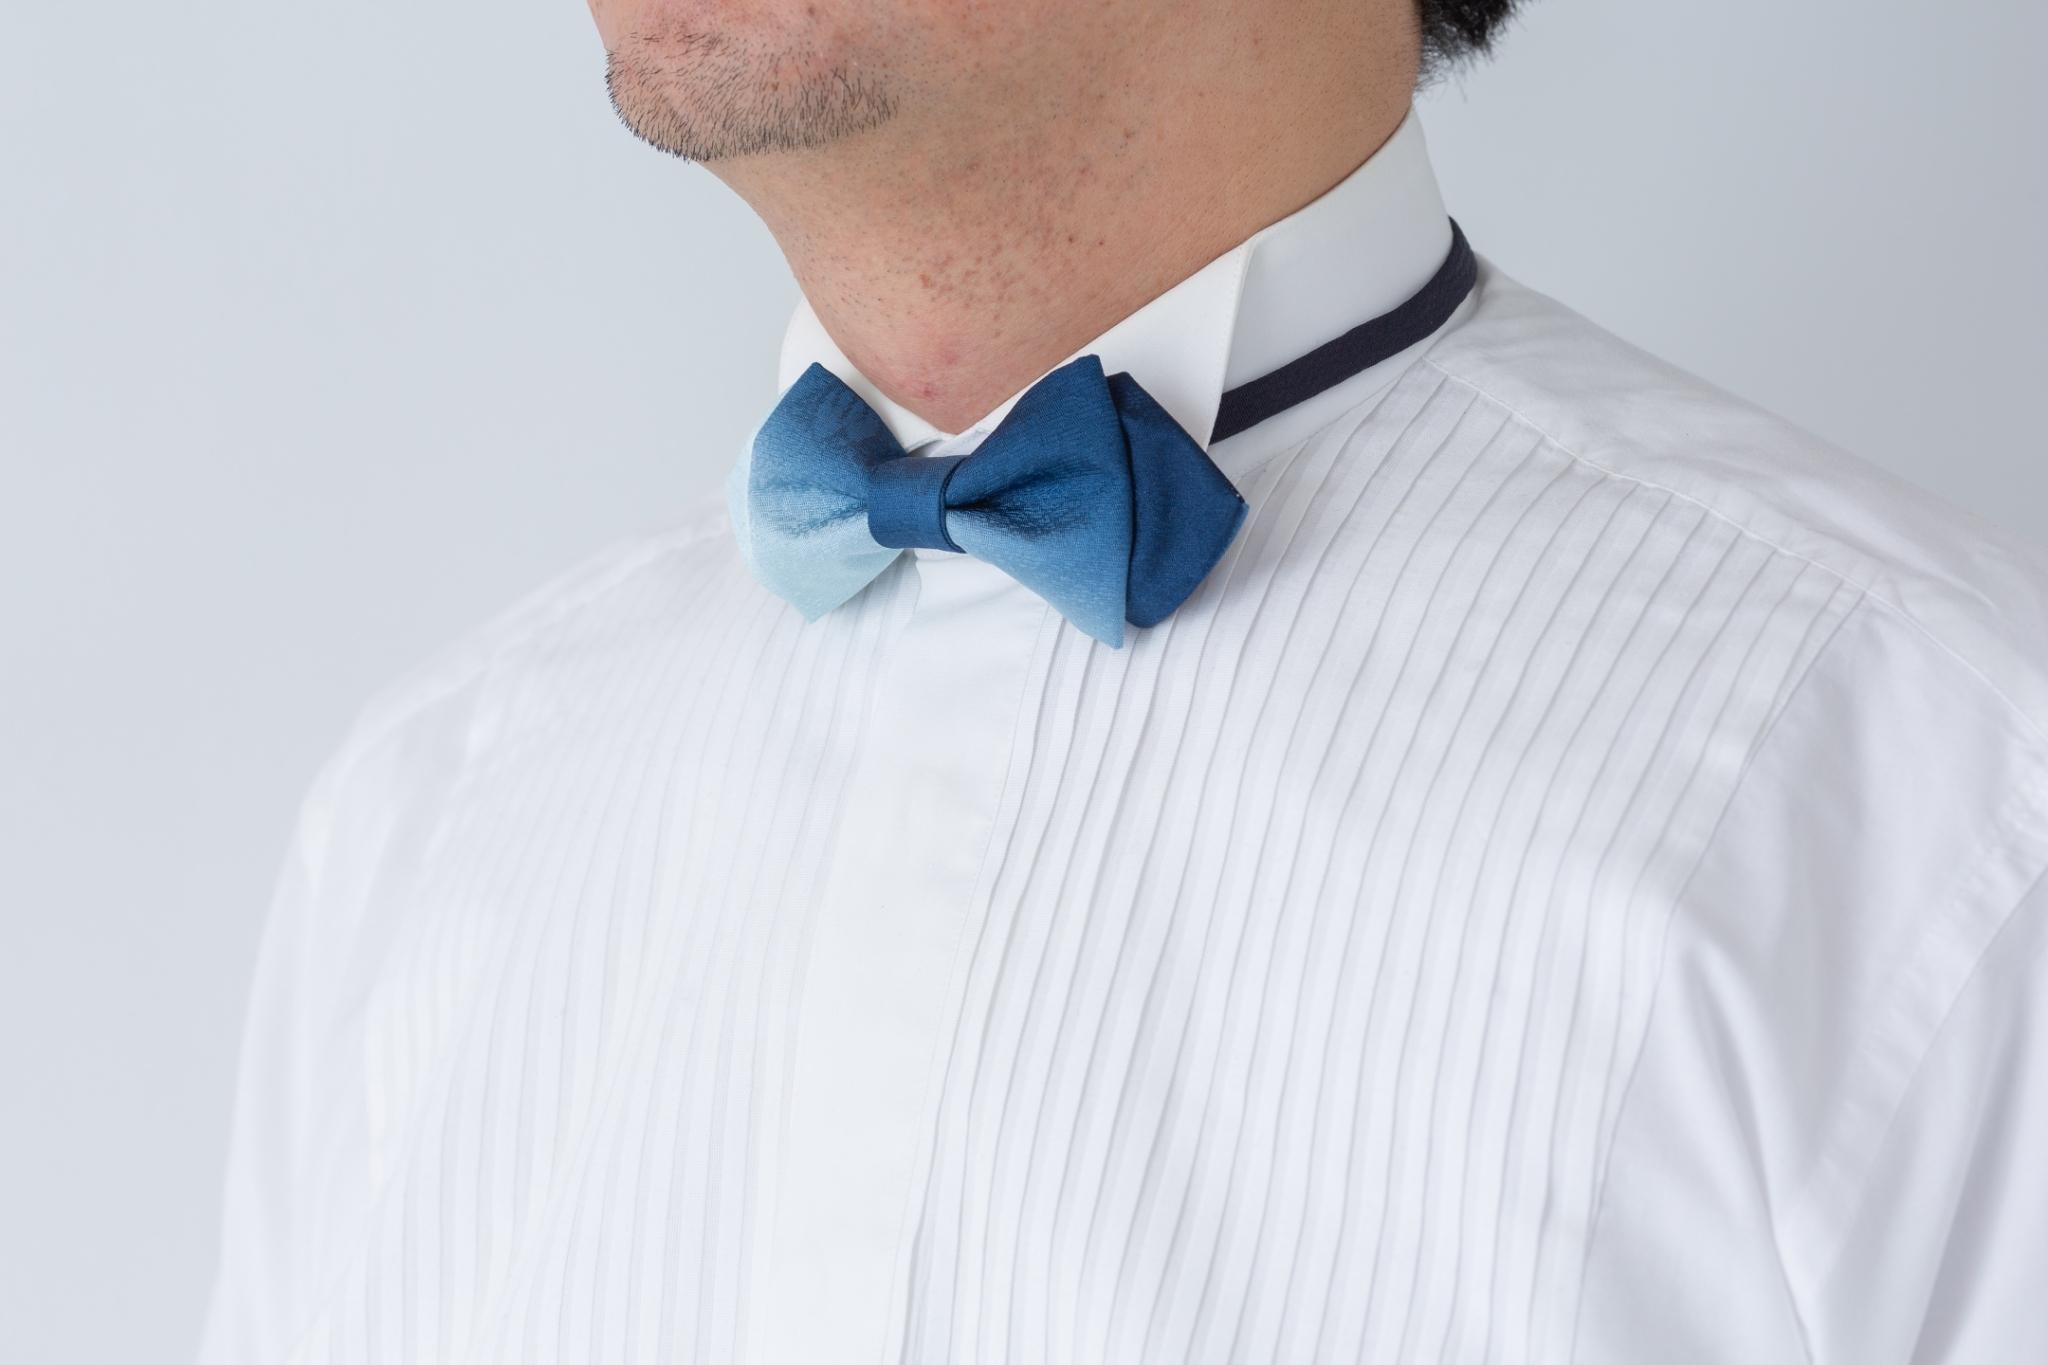 Chameleon Tie